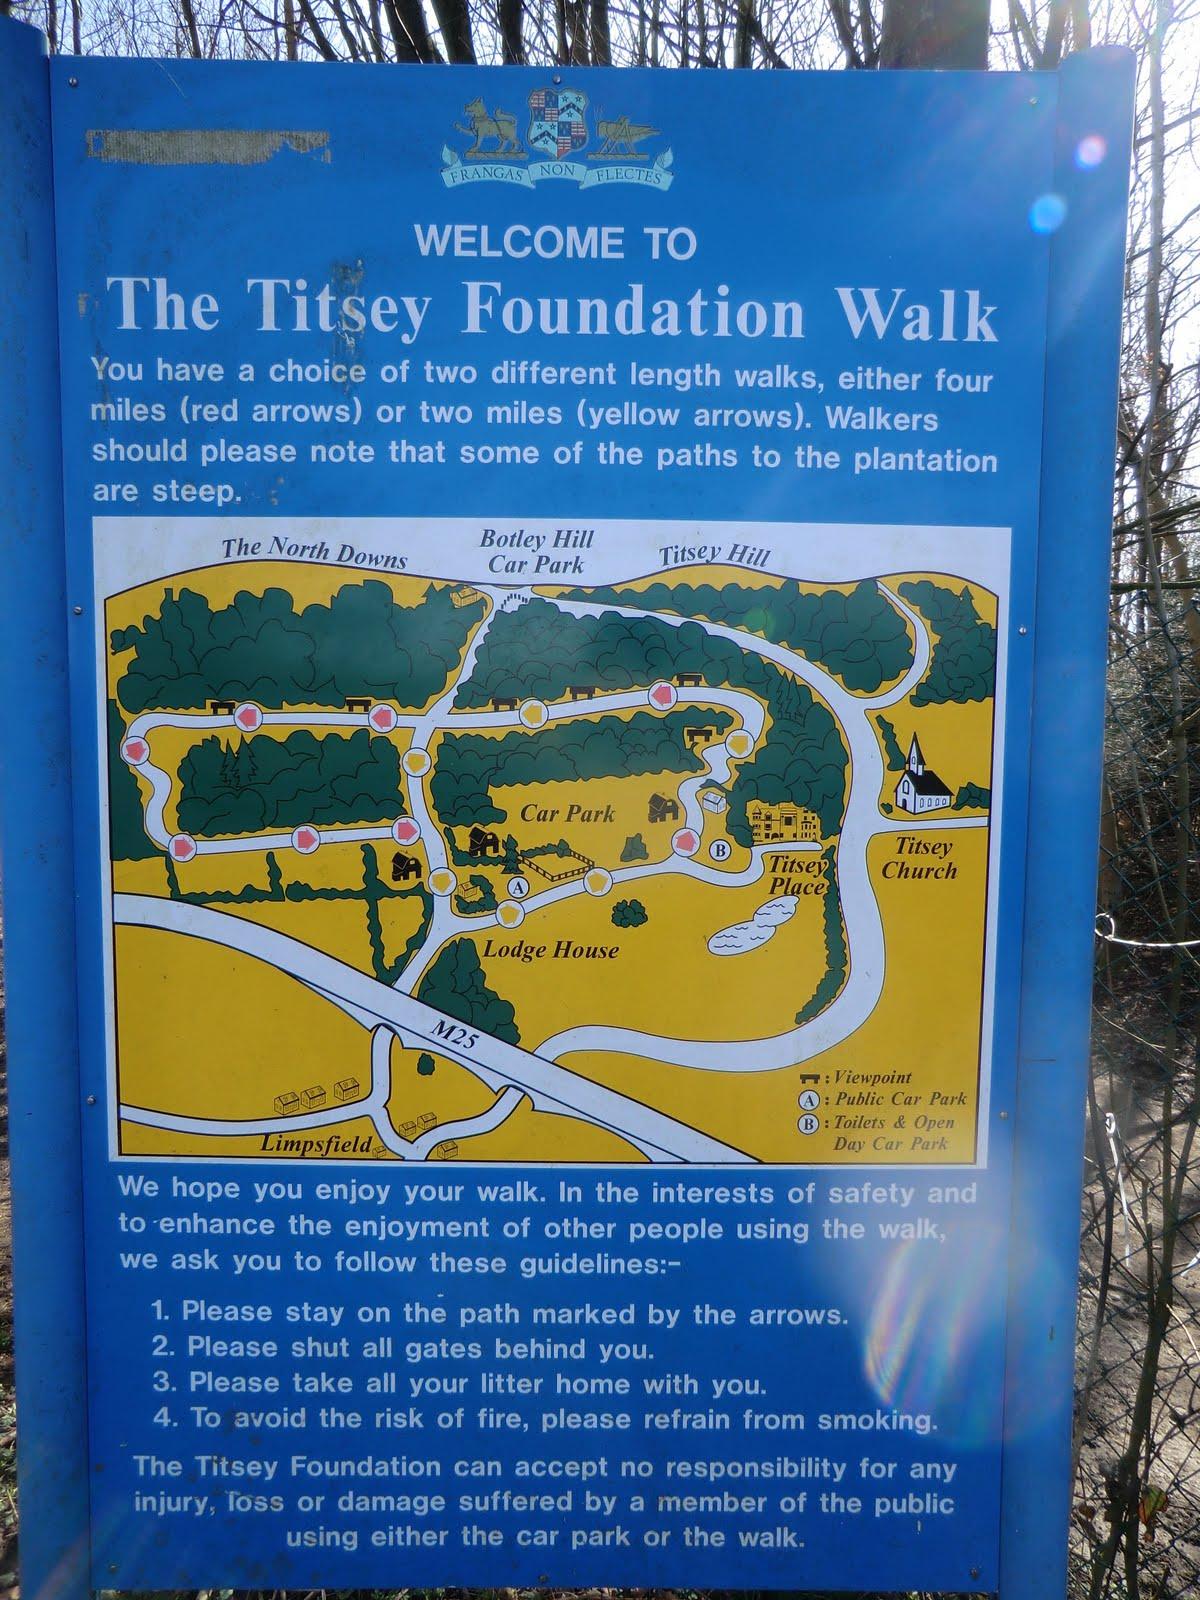 CIMG7044 The Titsey Foundation Walk